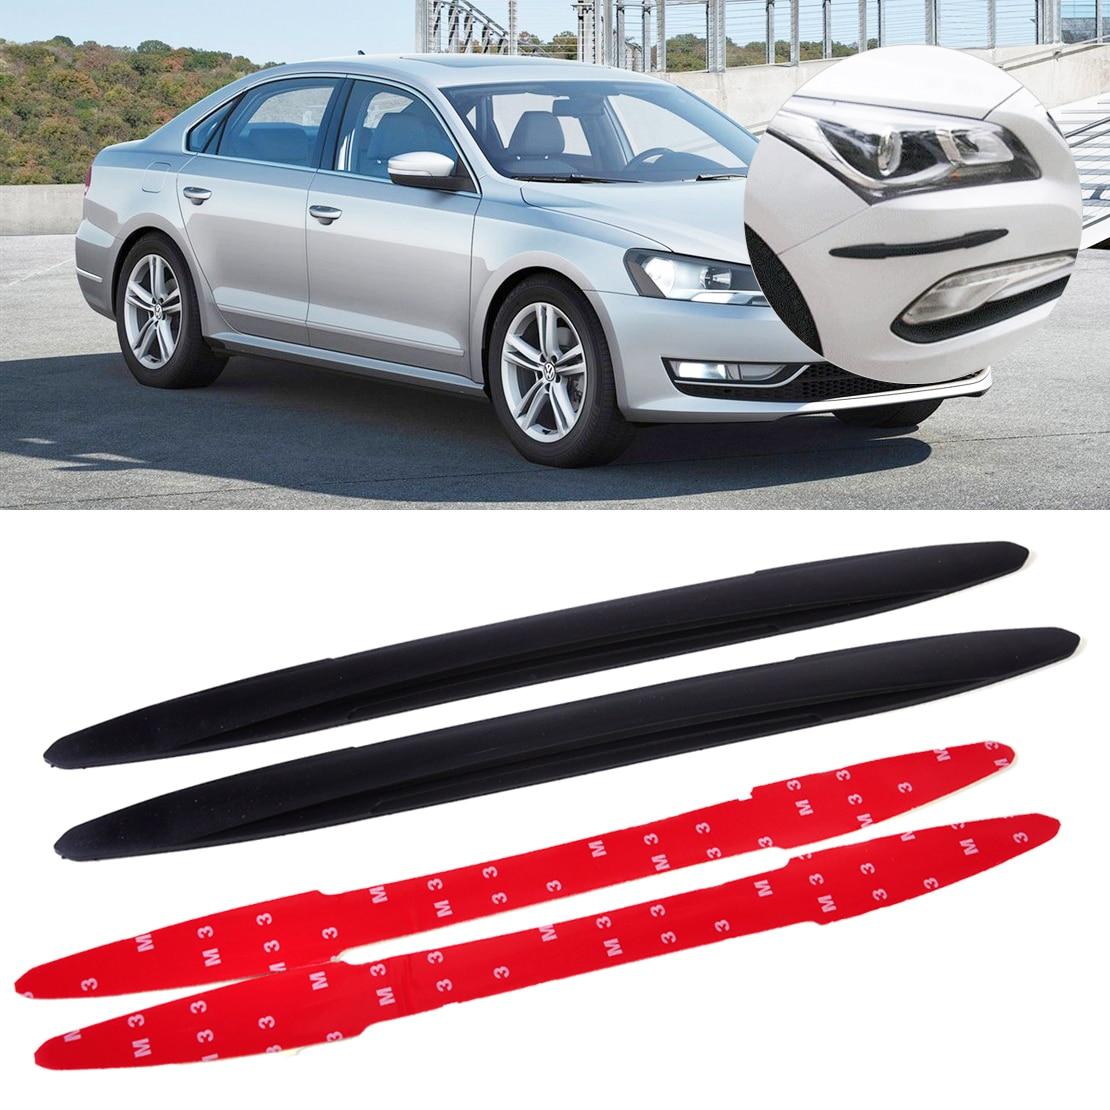 2PCS Universal Front /& Rear Car Bumper Protector Corner Guard Scratch Sticker